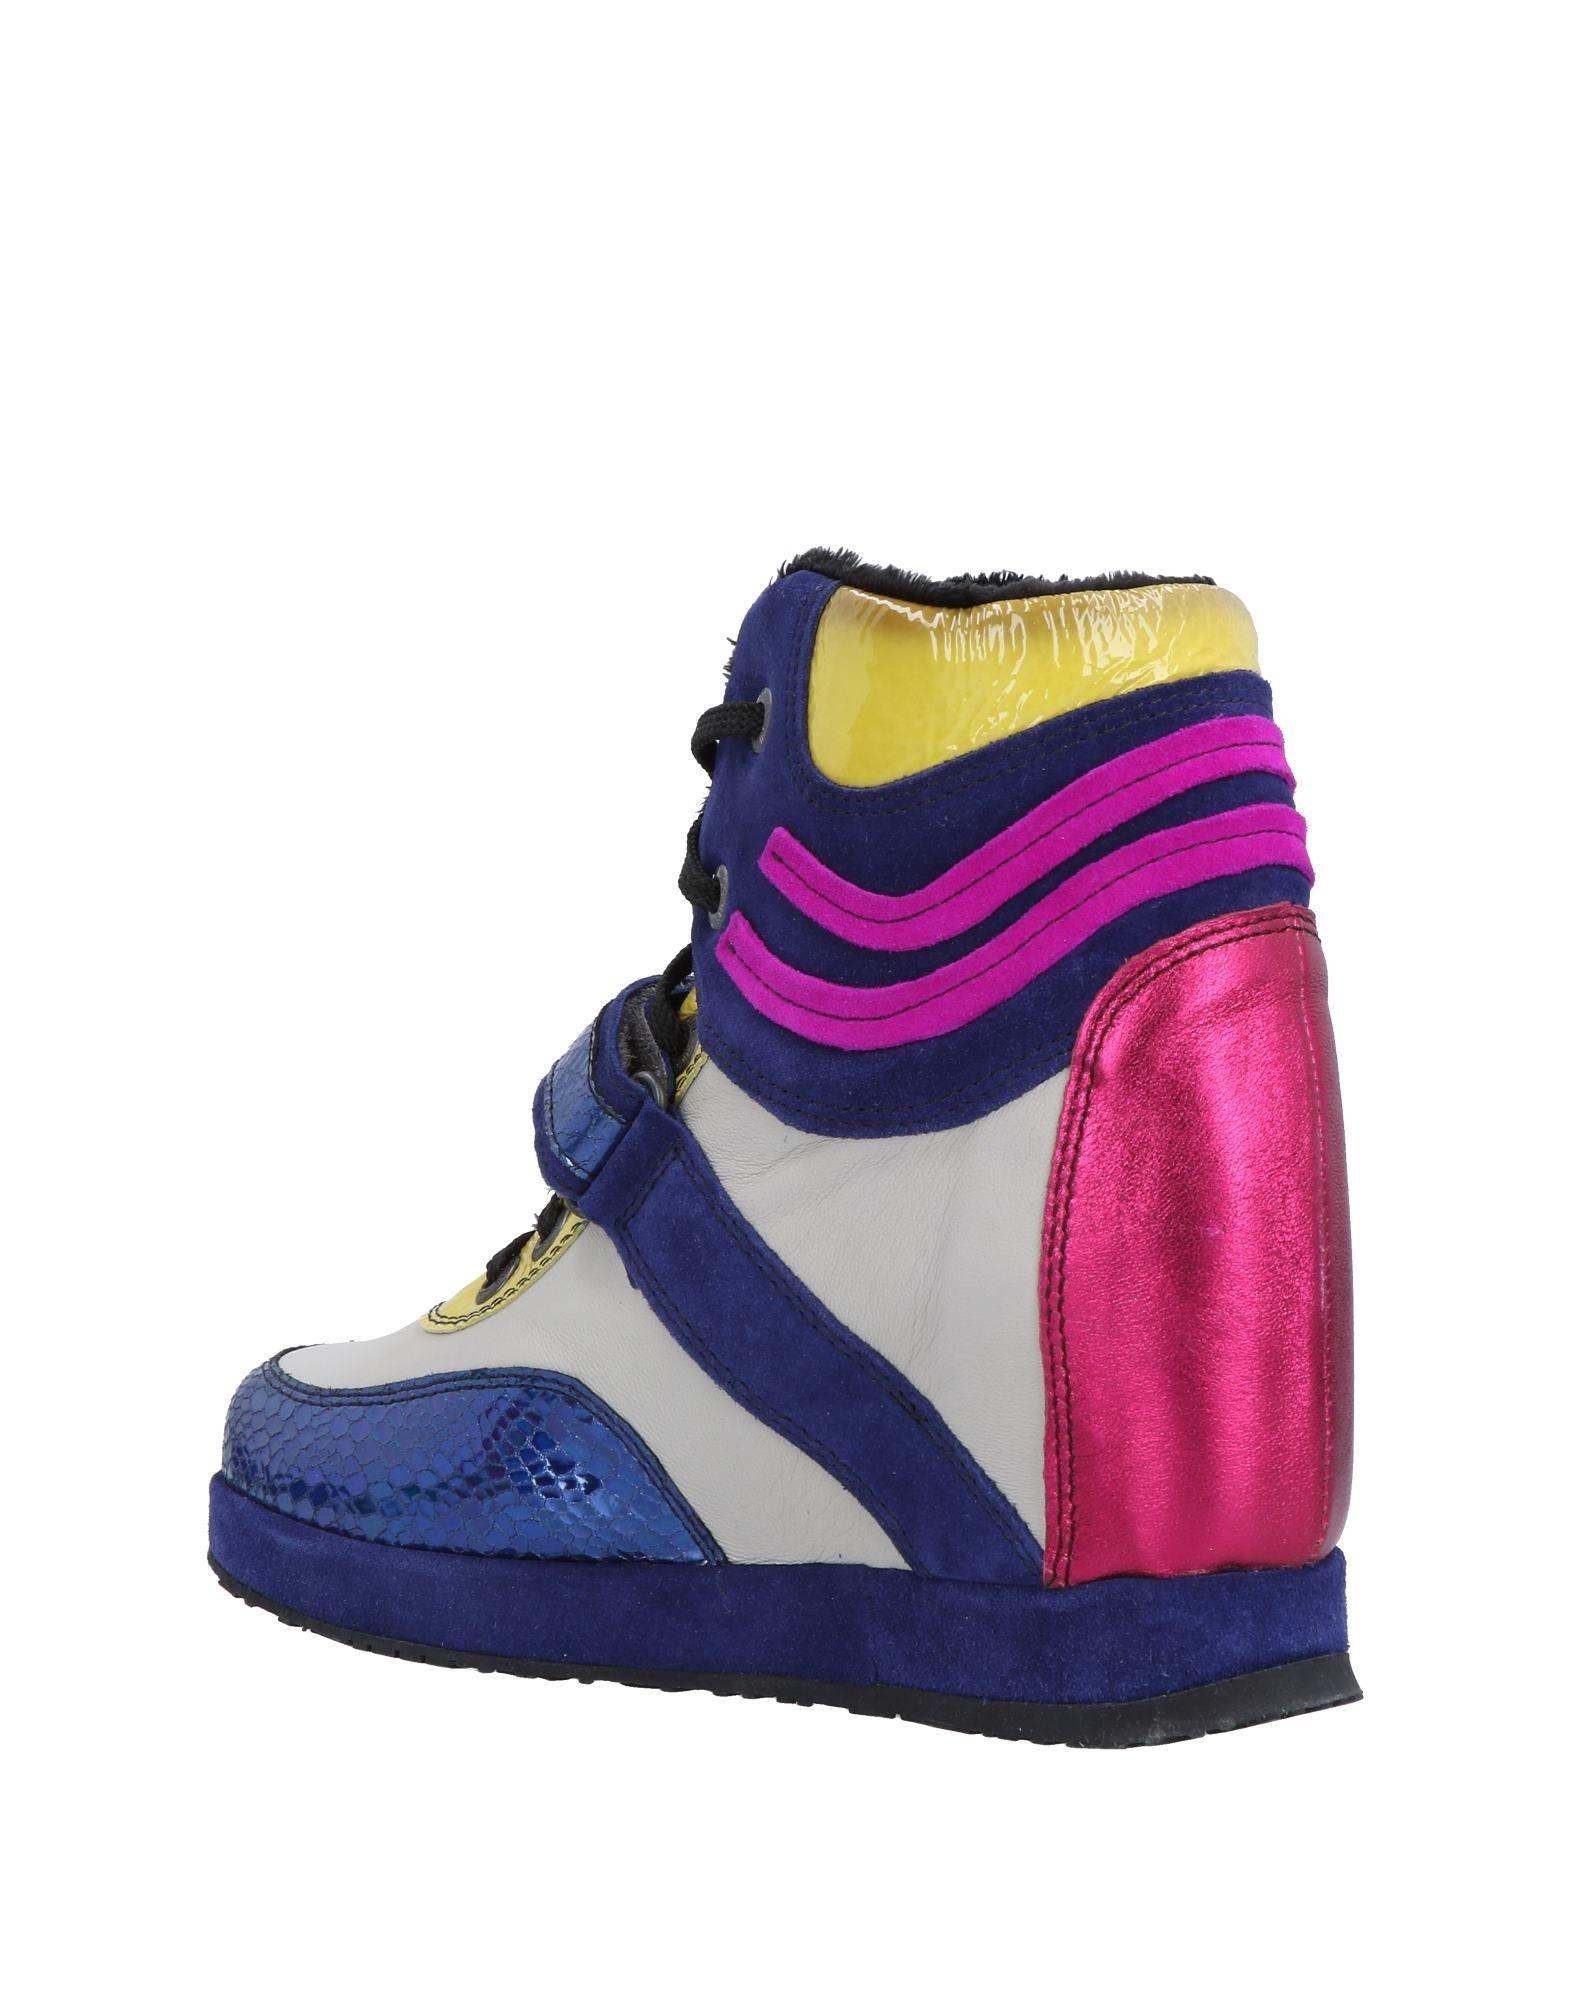 Ruco Line Sneakers Damen  Schuhe 11476862KW Gute Qualität beliebte Schuhe  6fb67b